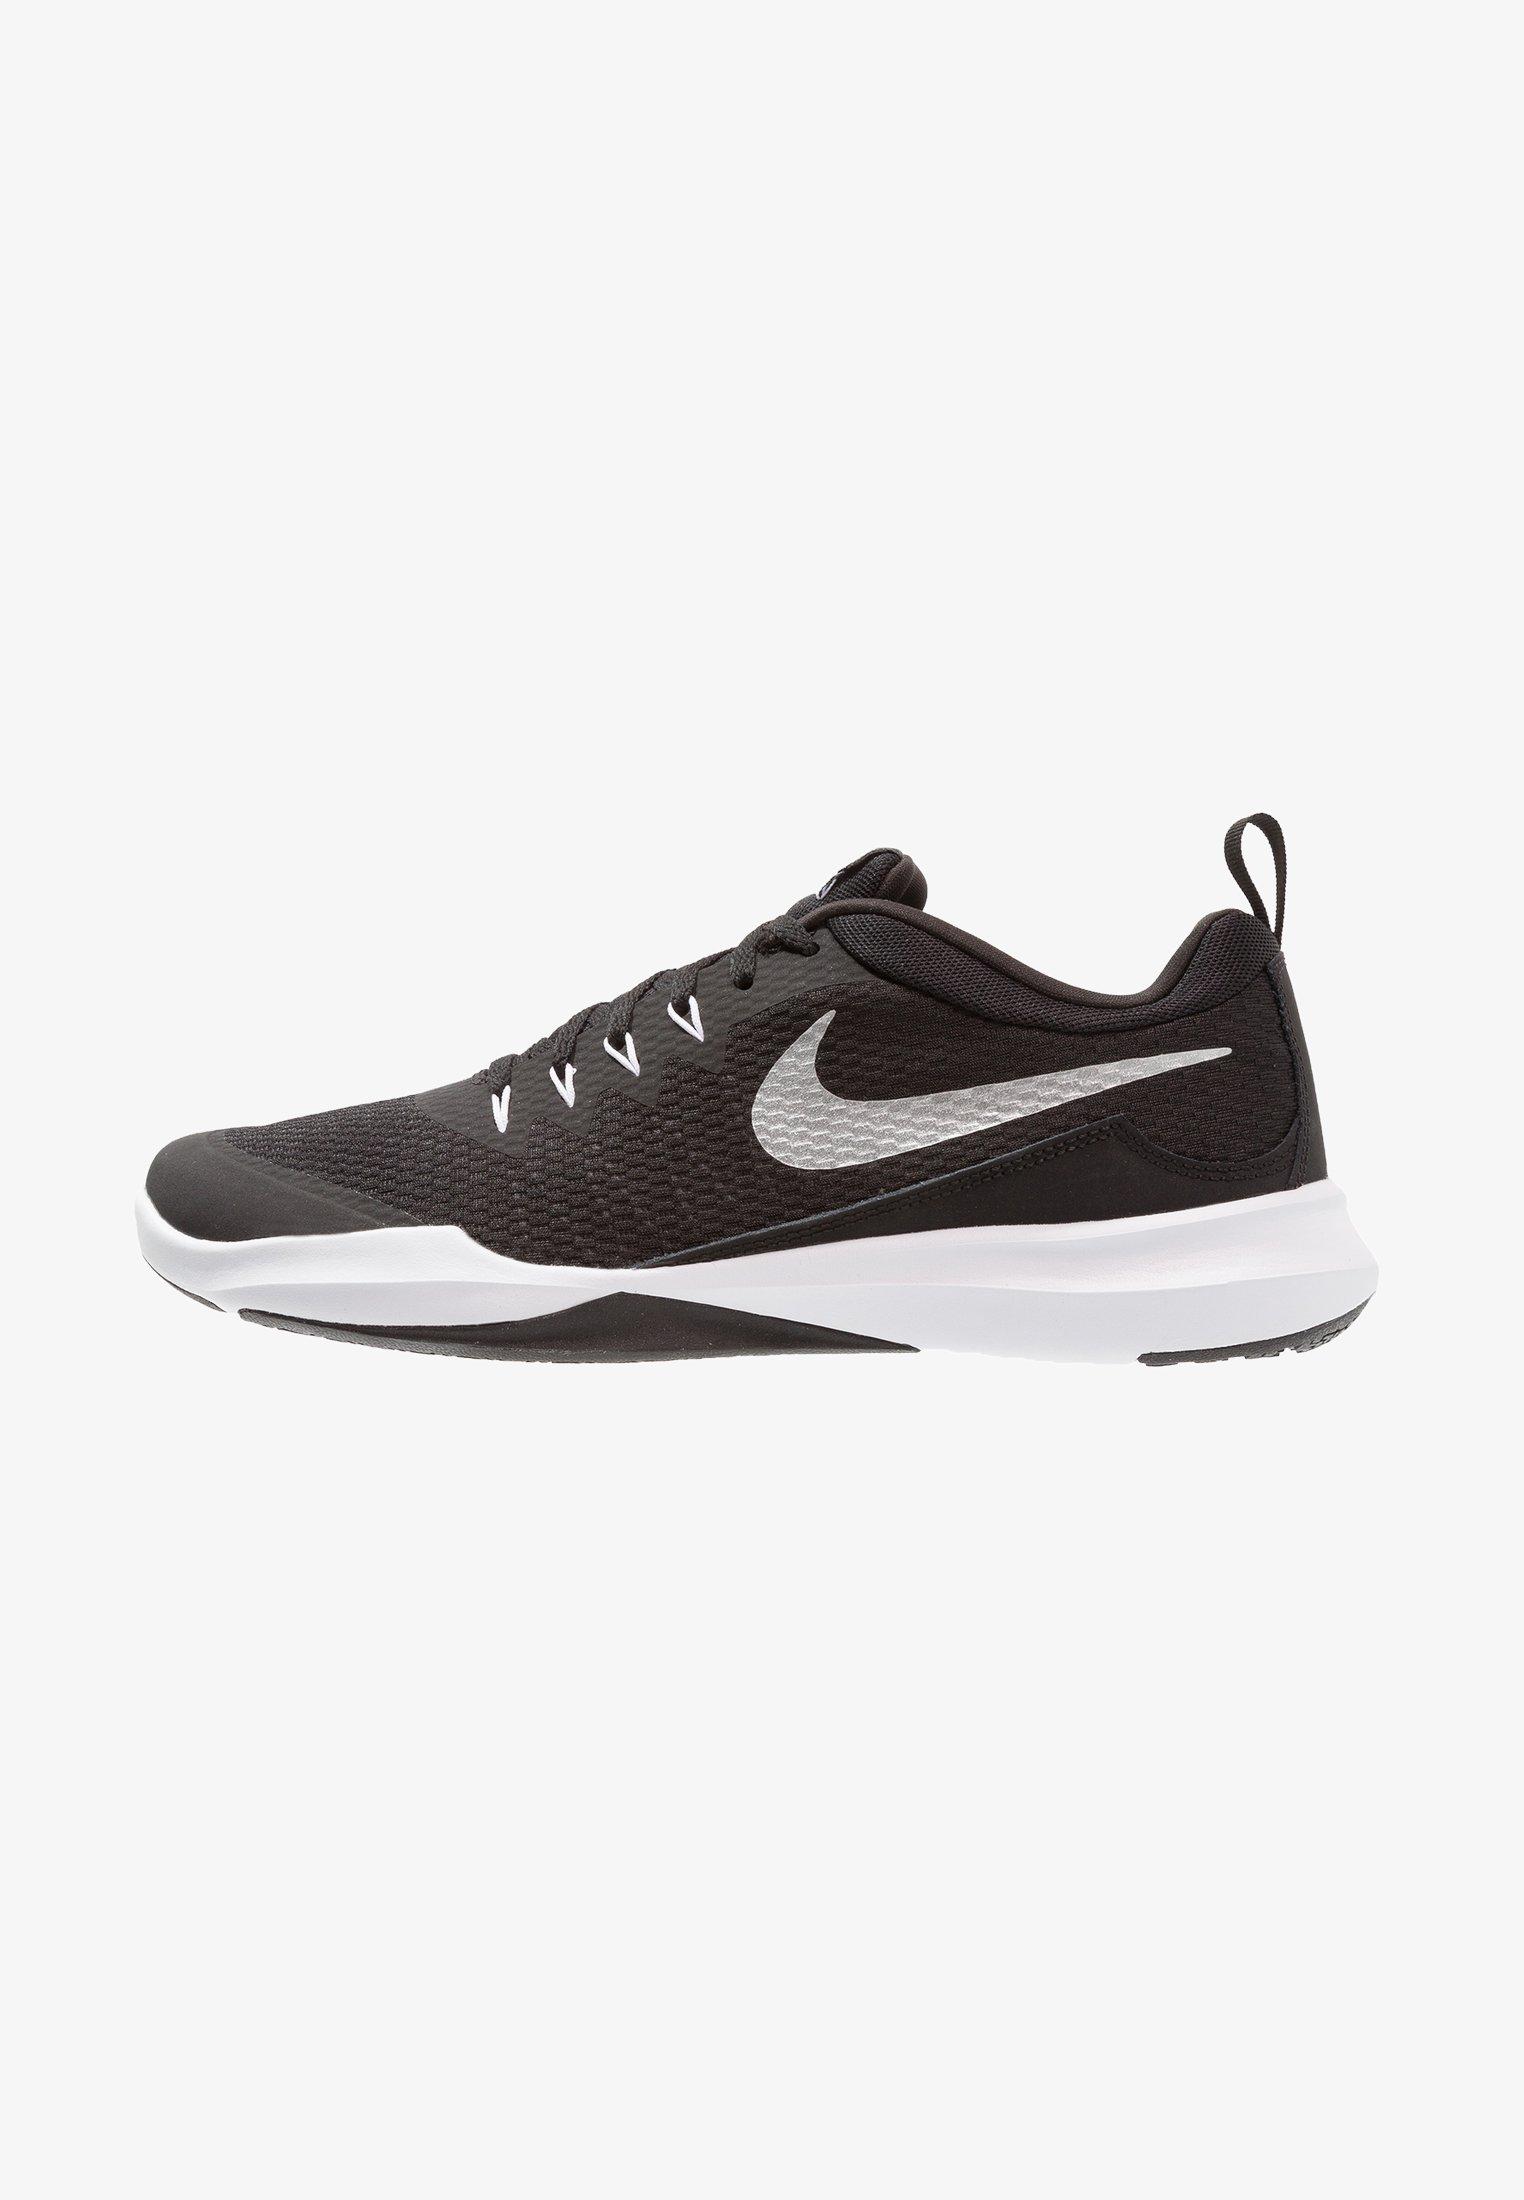 Radioactivo Alentar alegría  Nike Performance LEGEND TRAINER - Sports shoes - black/metallic  silver/white/black - Zalando.co.uk